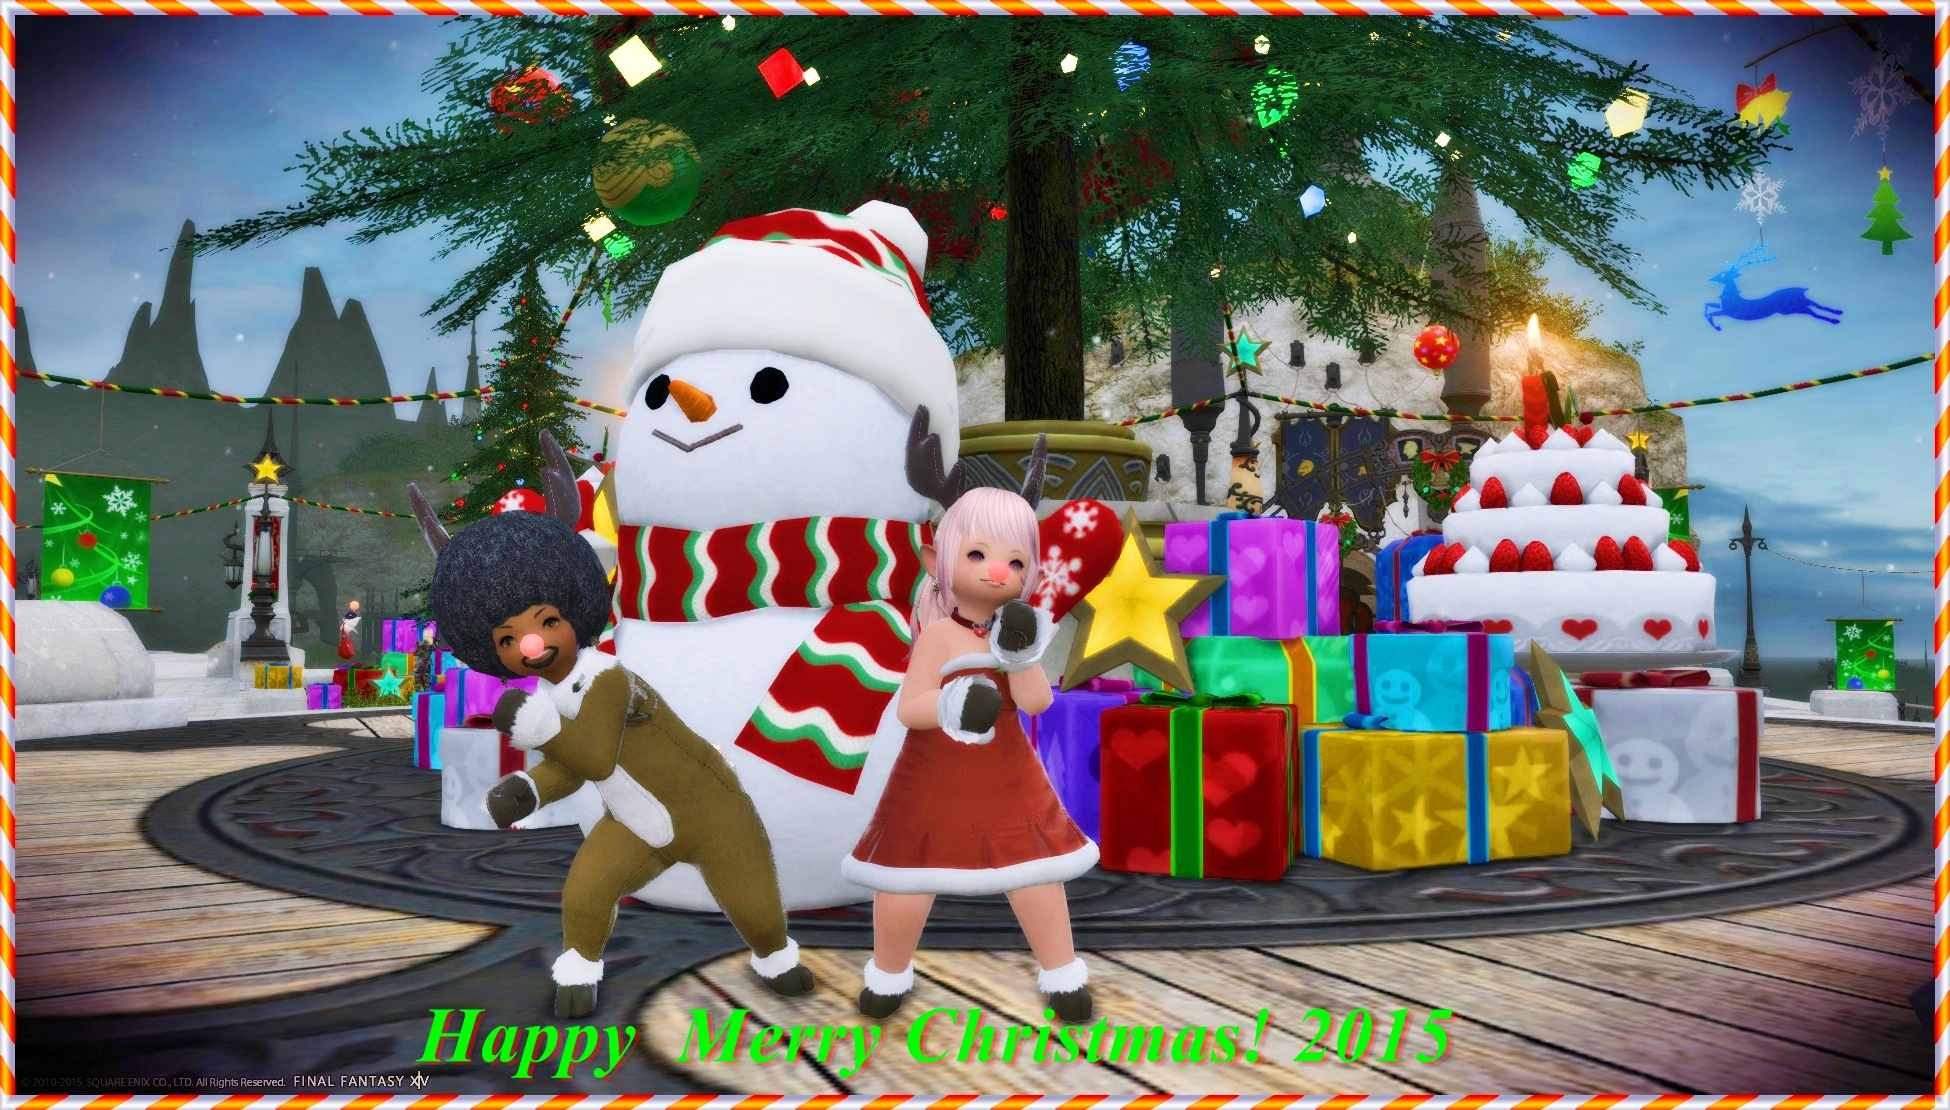 merry christmas! 2015